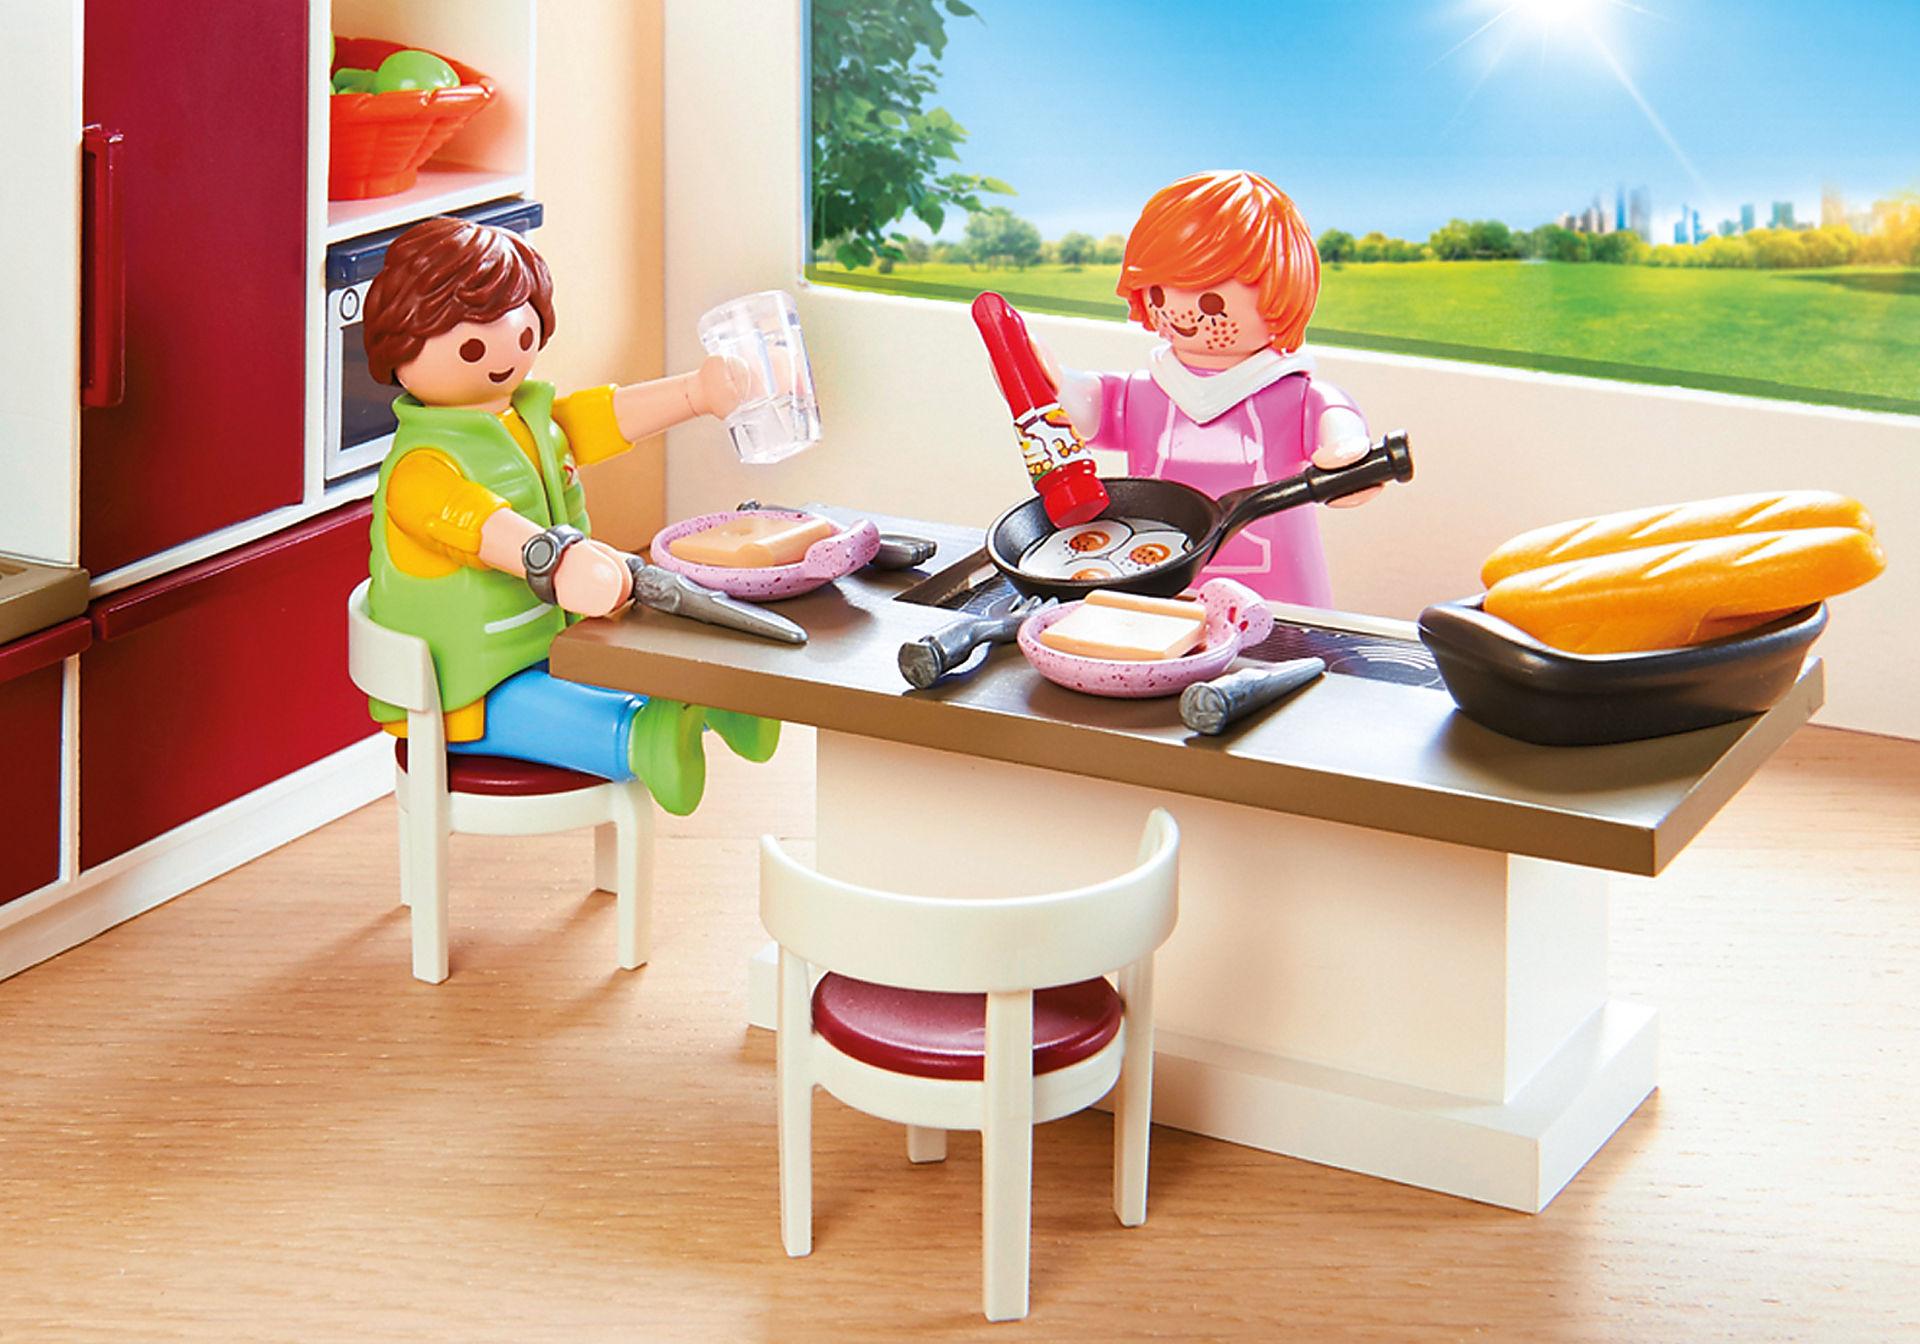 http://media.playmobil.com/i/playmobil/9269_product_extra1/Große Familienküche